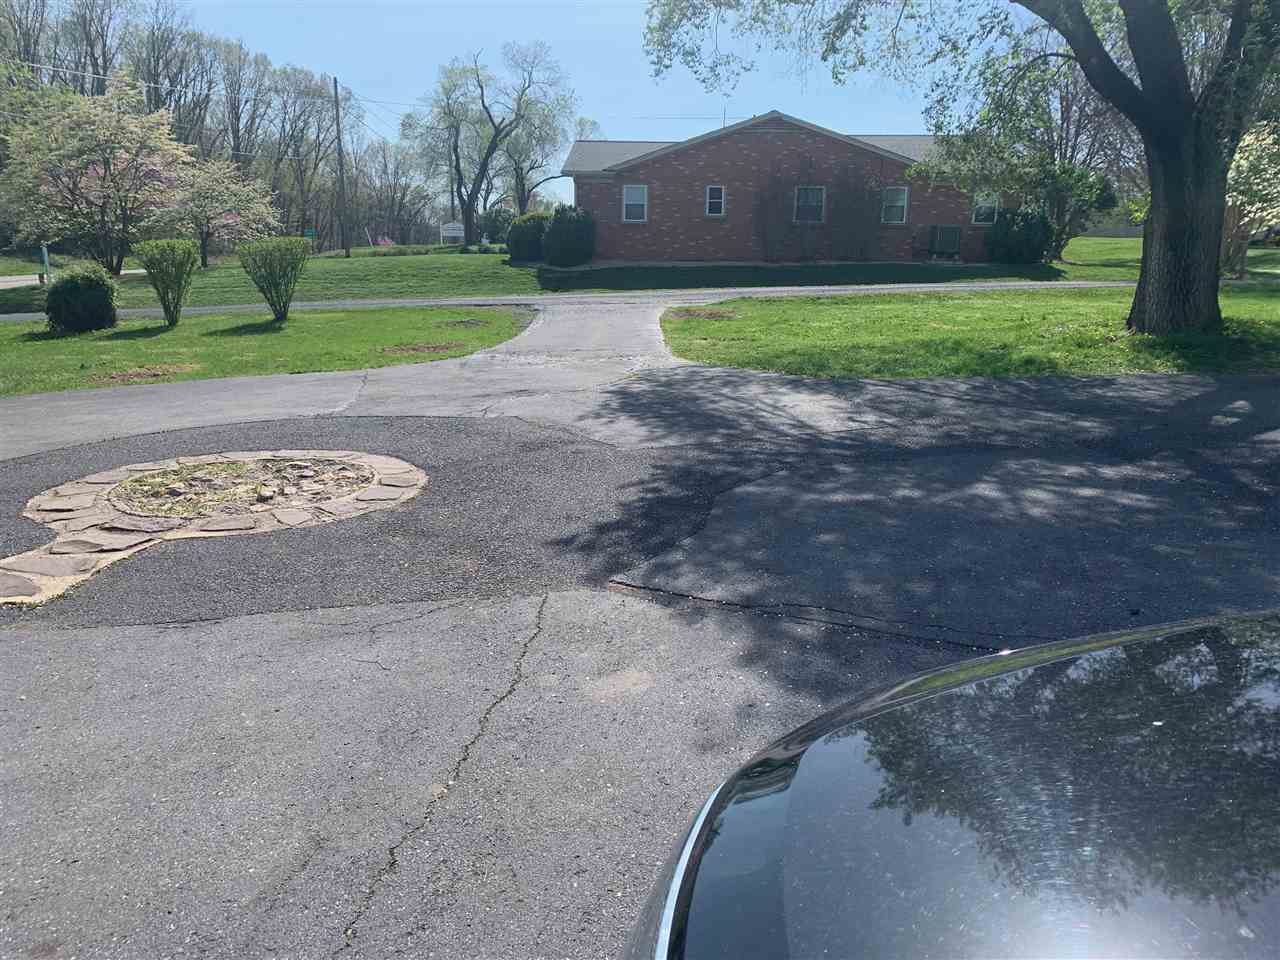 785 Lee Jackson Hwy, Staunton, VA, 24401